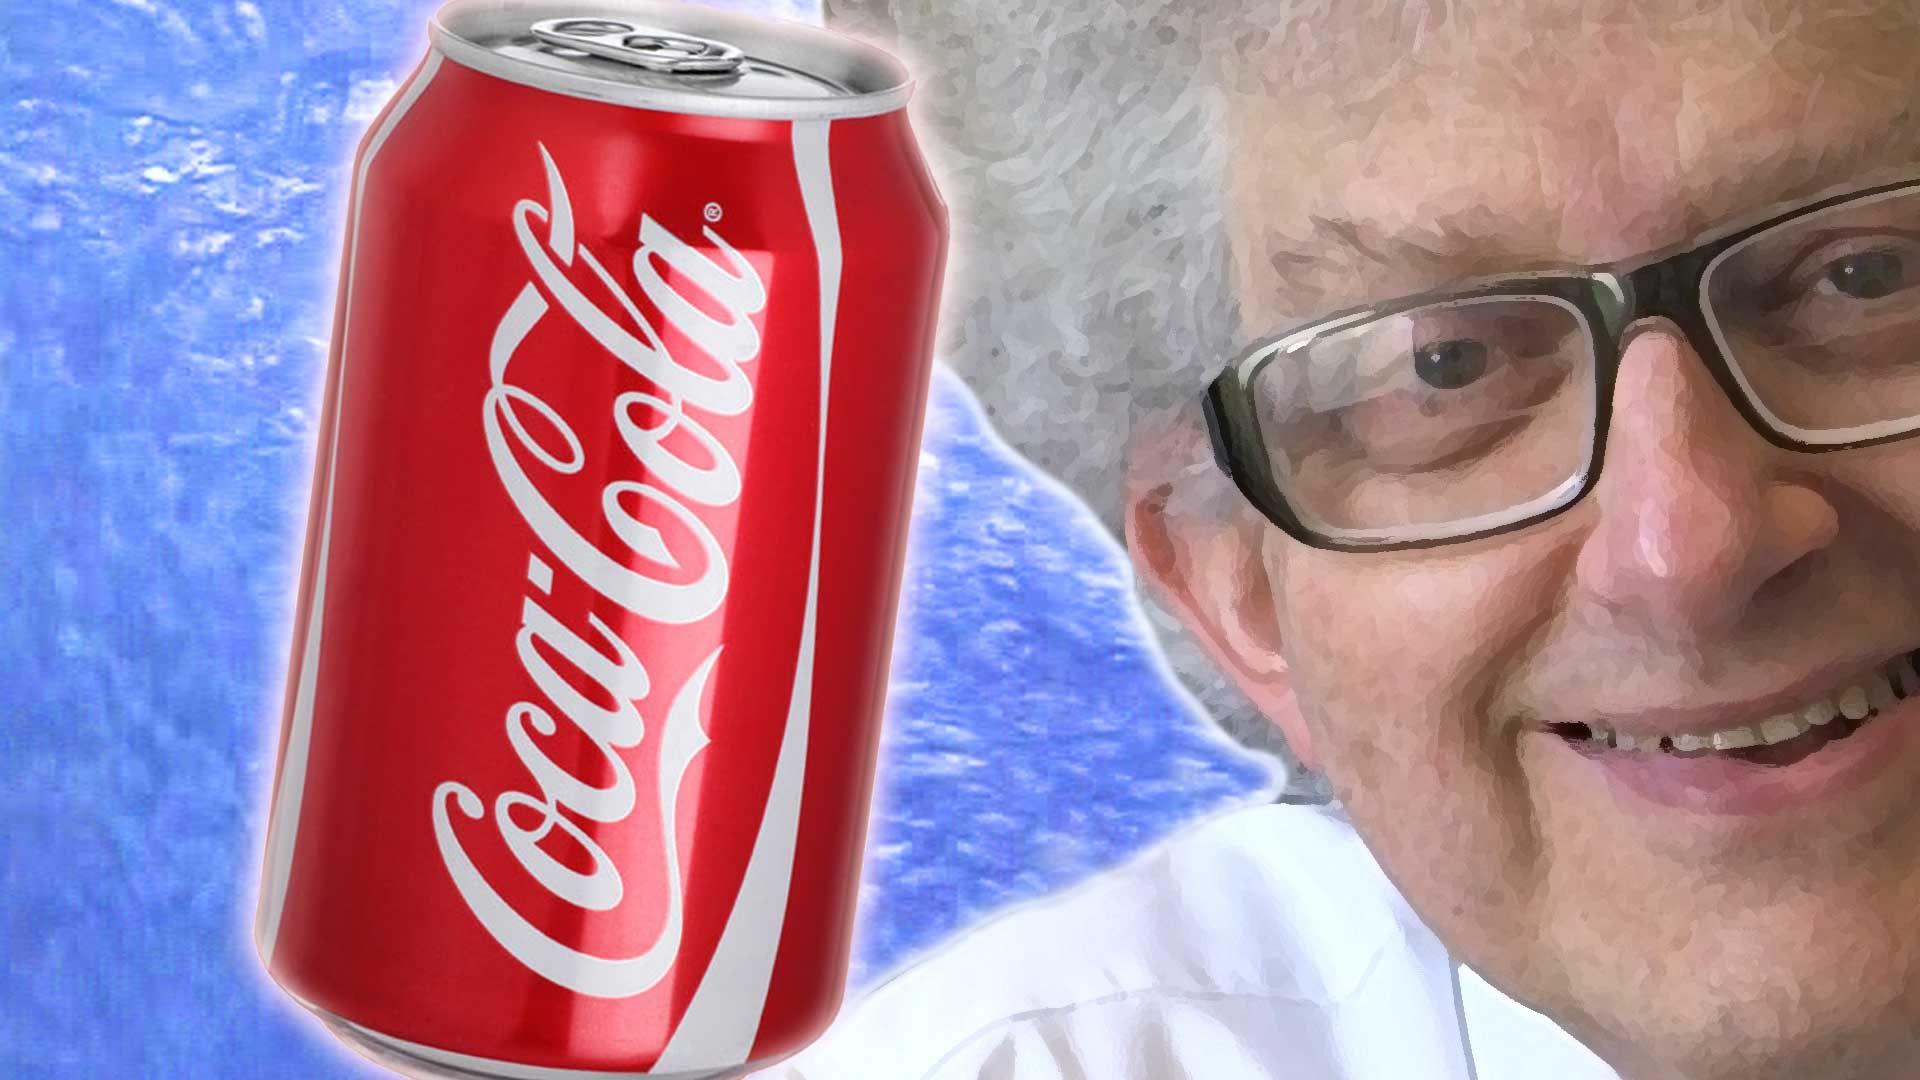 What happens when you drop a can of Coke into liquid nitrogen?